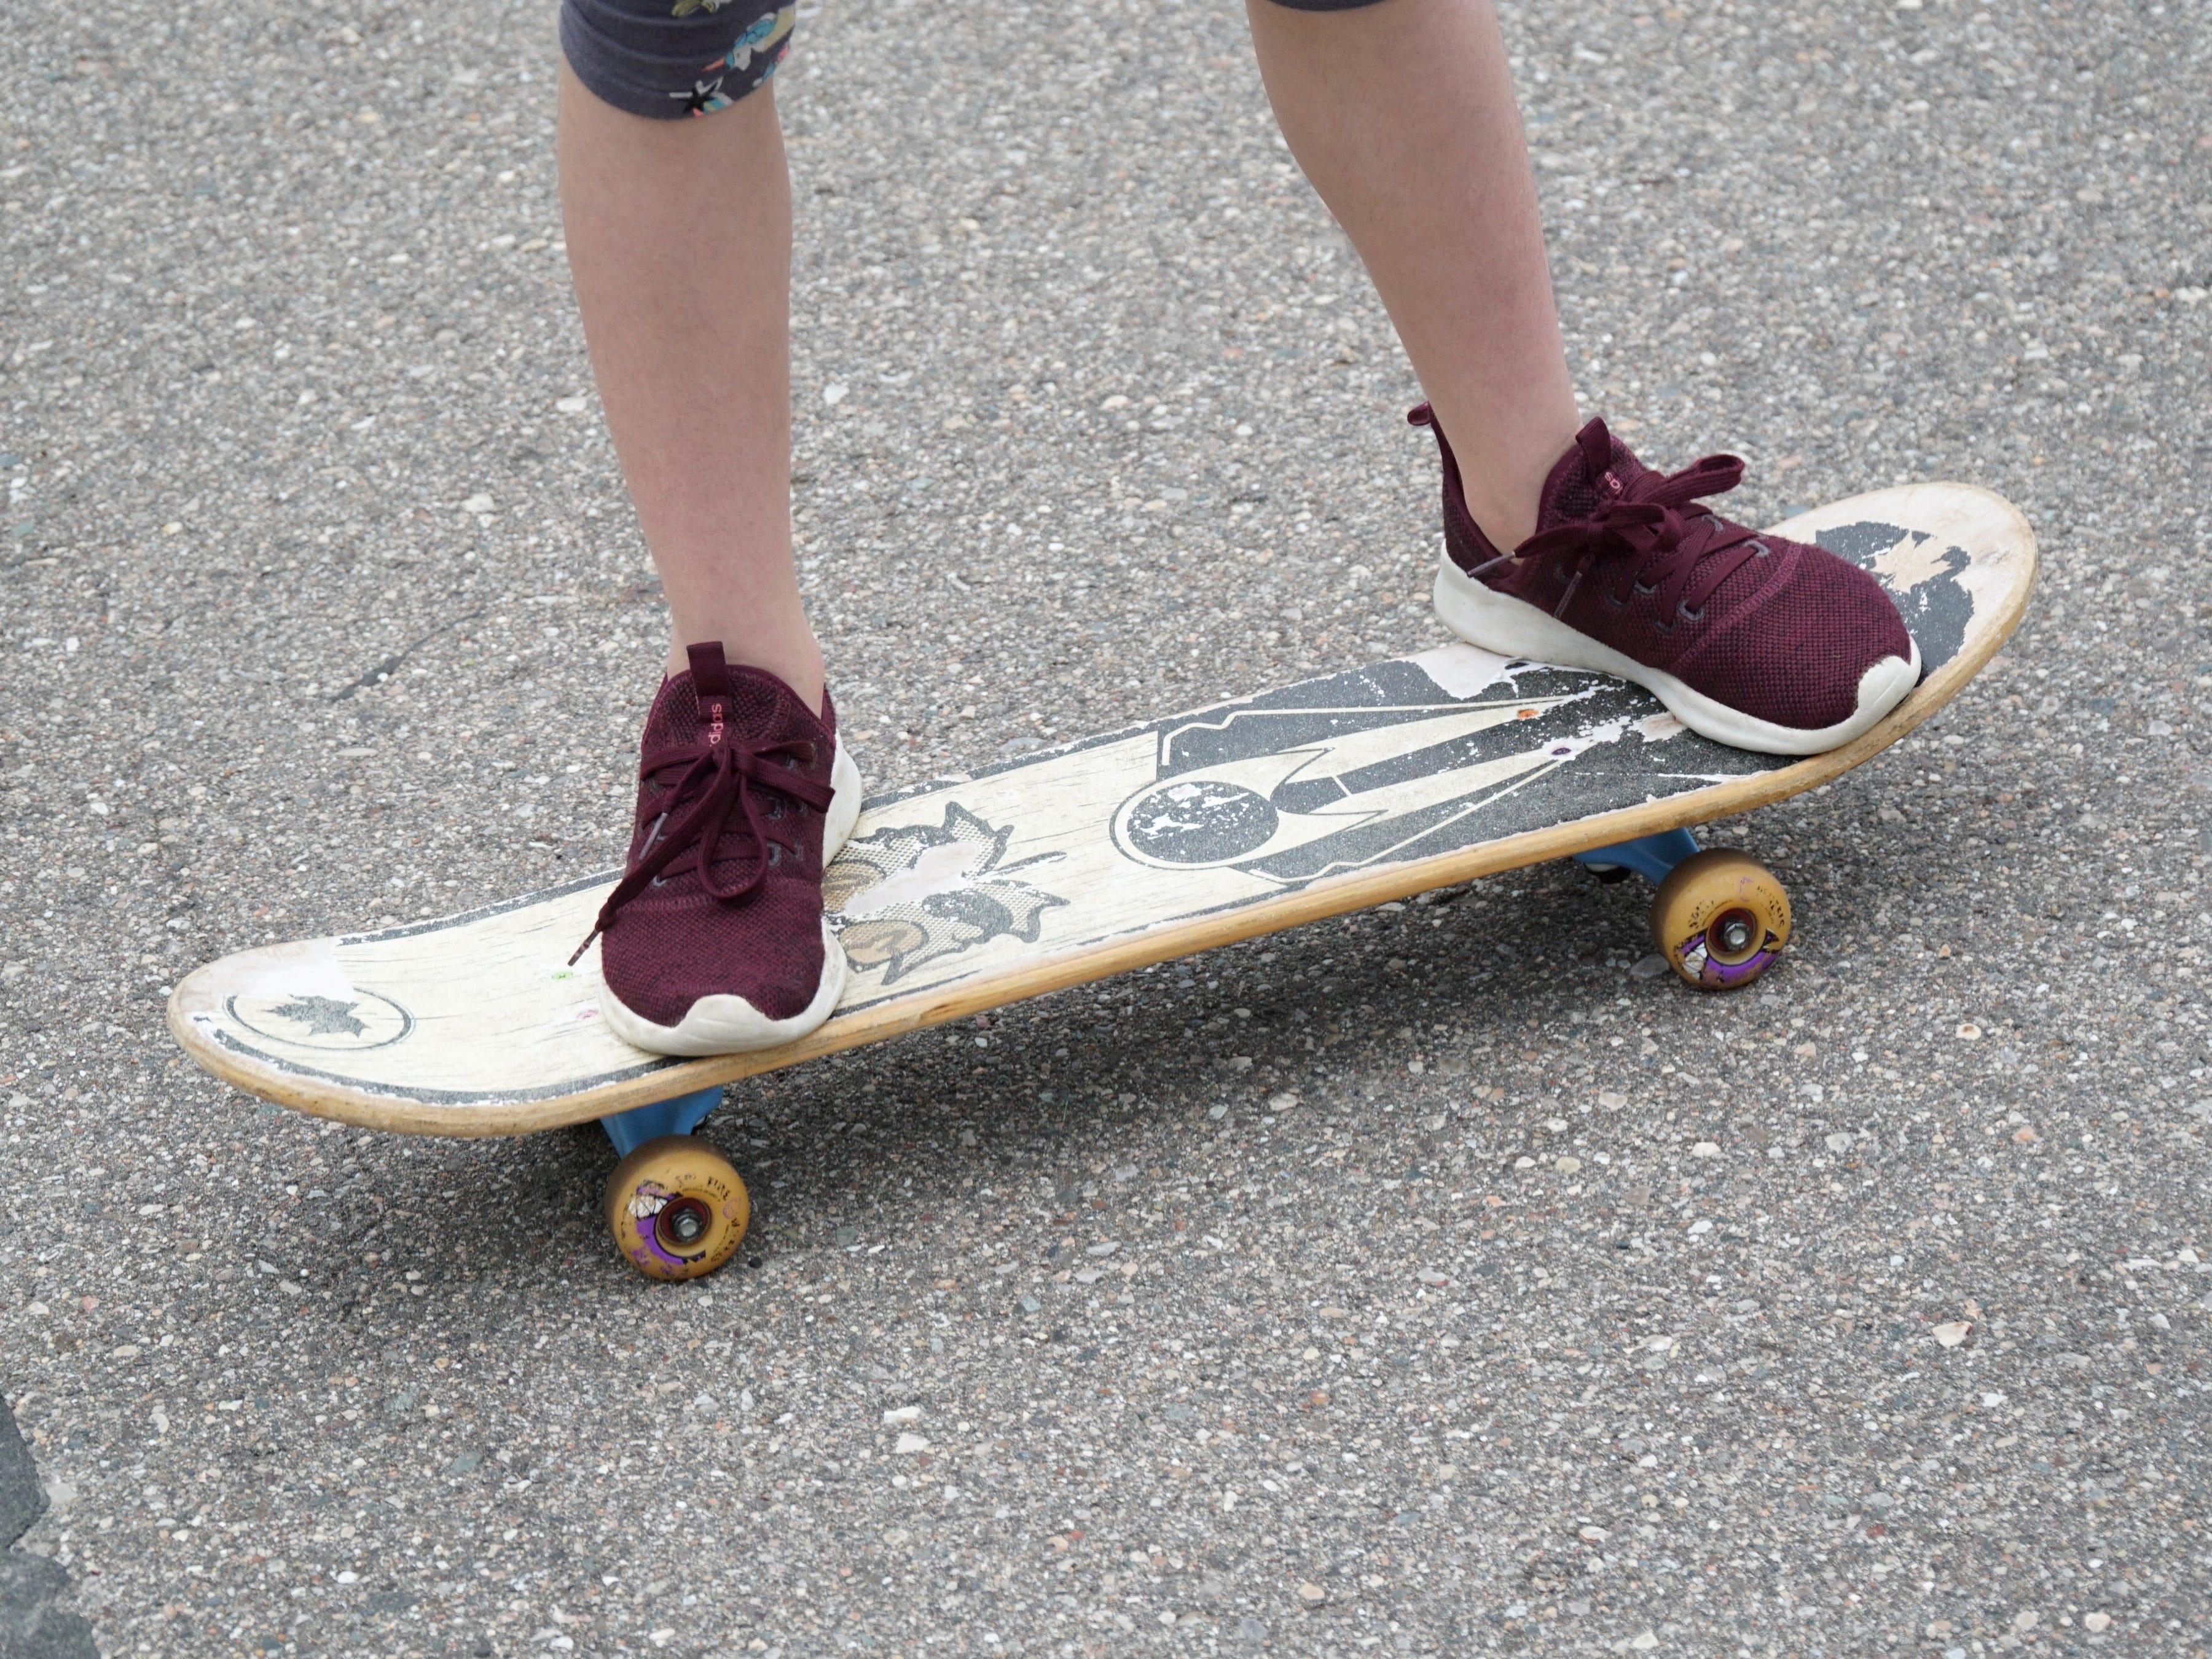 Lovey Stempien, 9, on her skateboard.